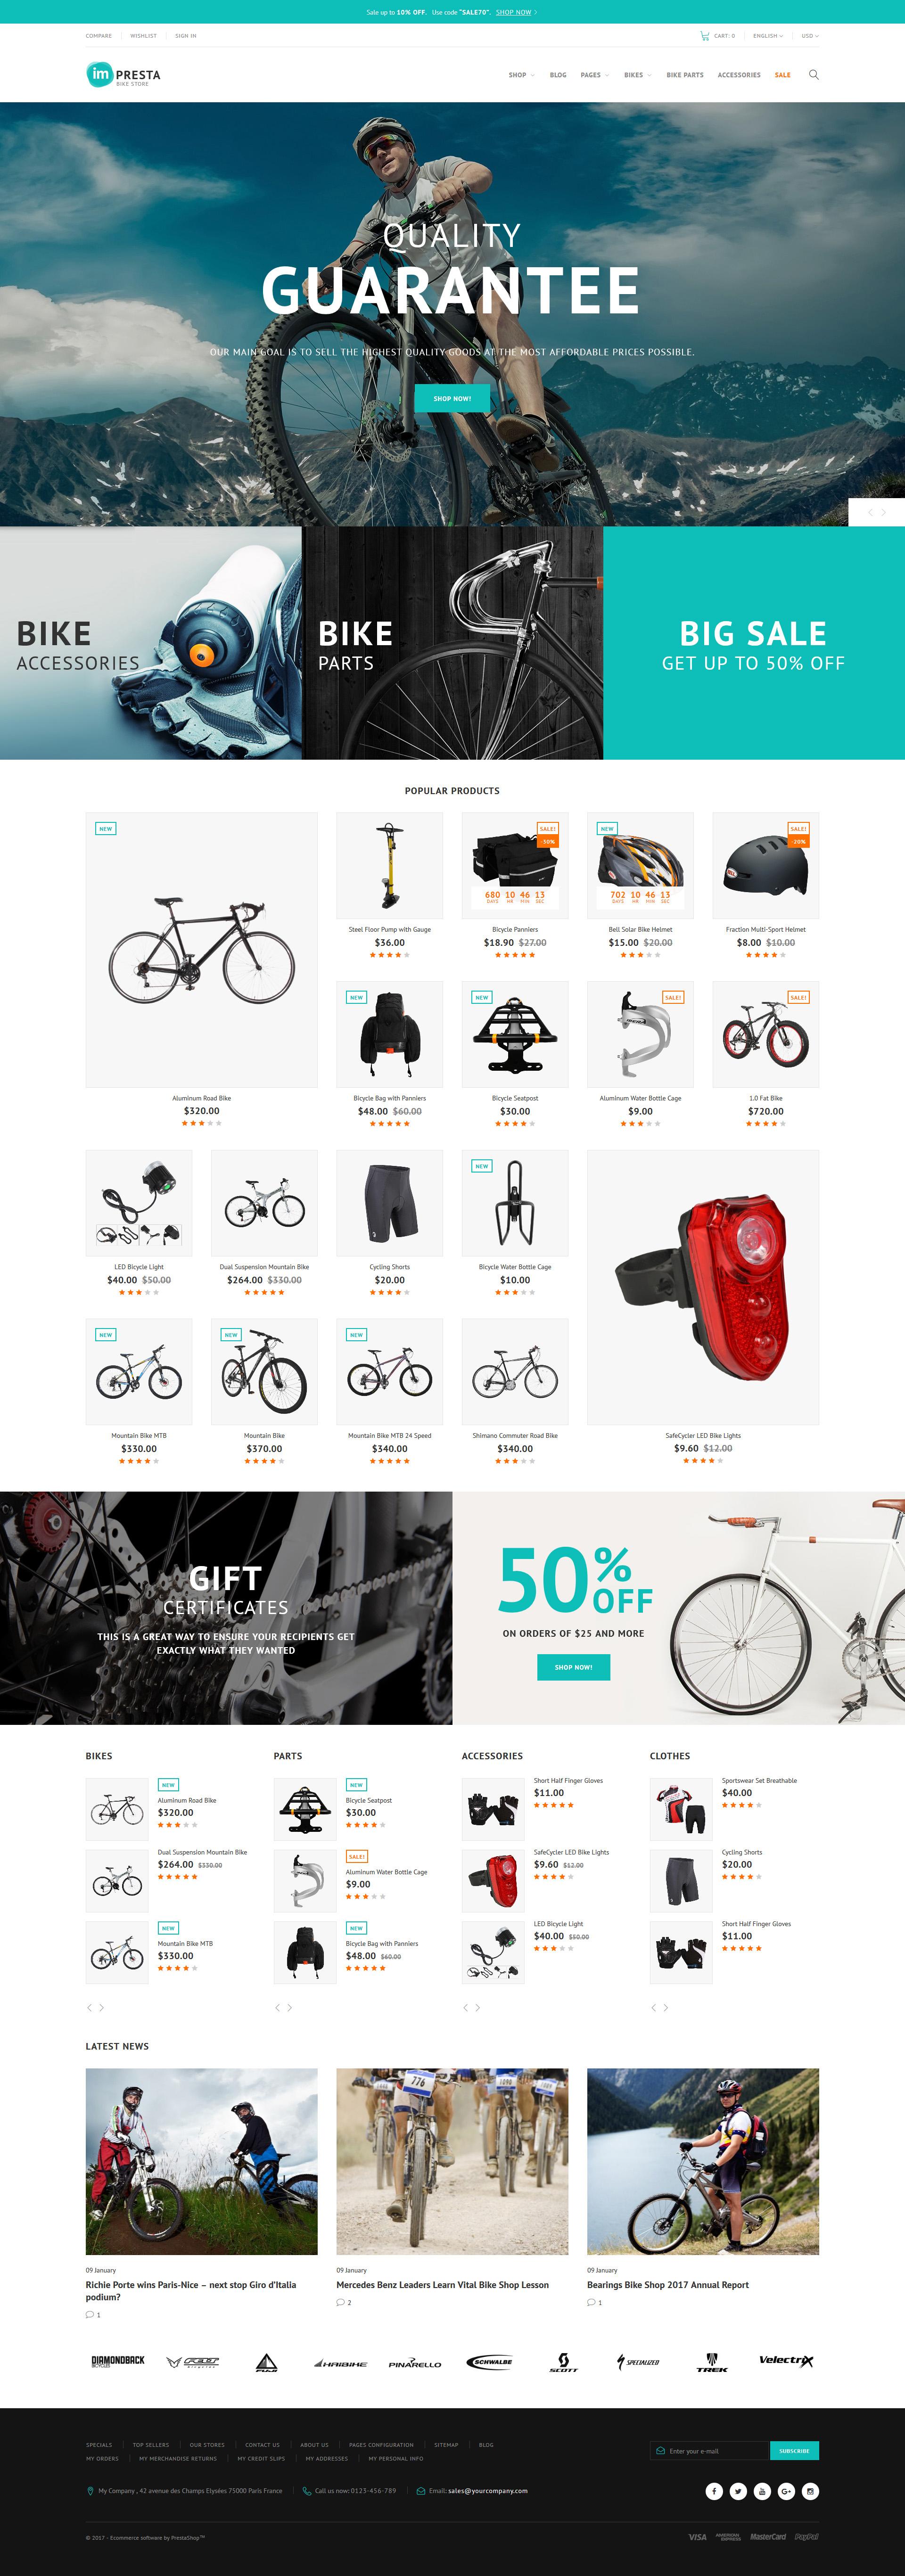 Impresta - Bike Store Tema PrestaShop №64382 - screenshot